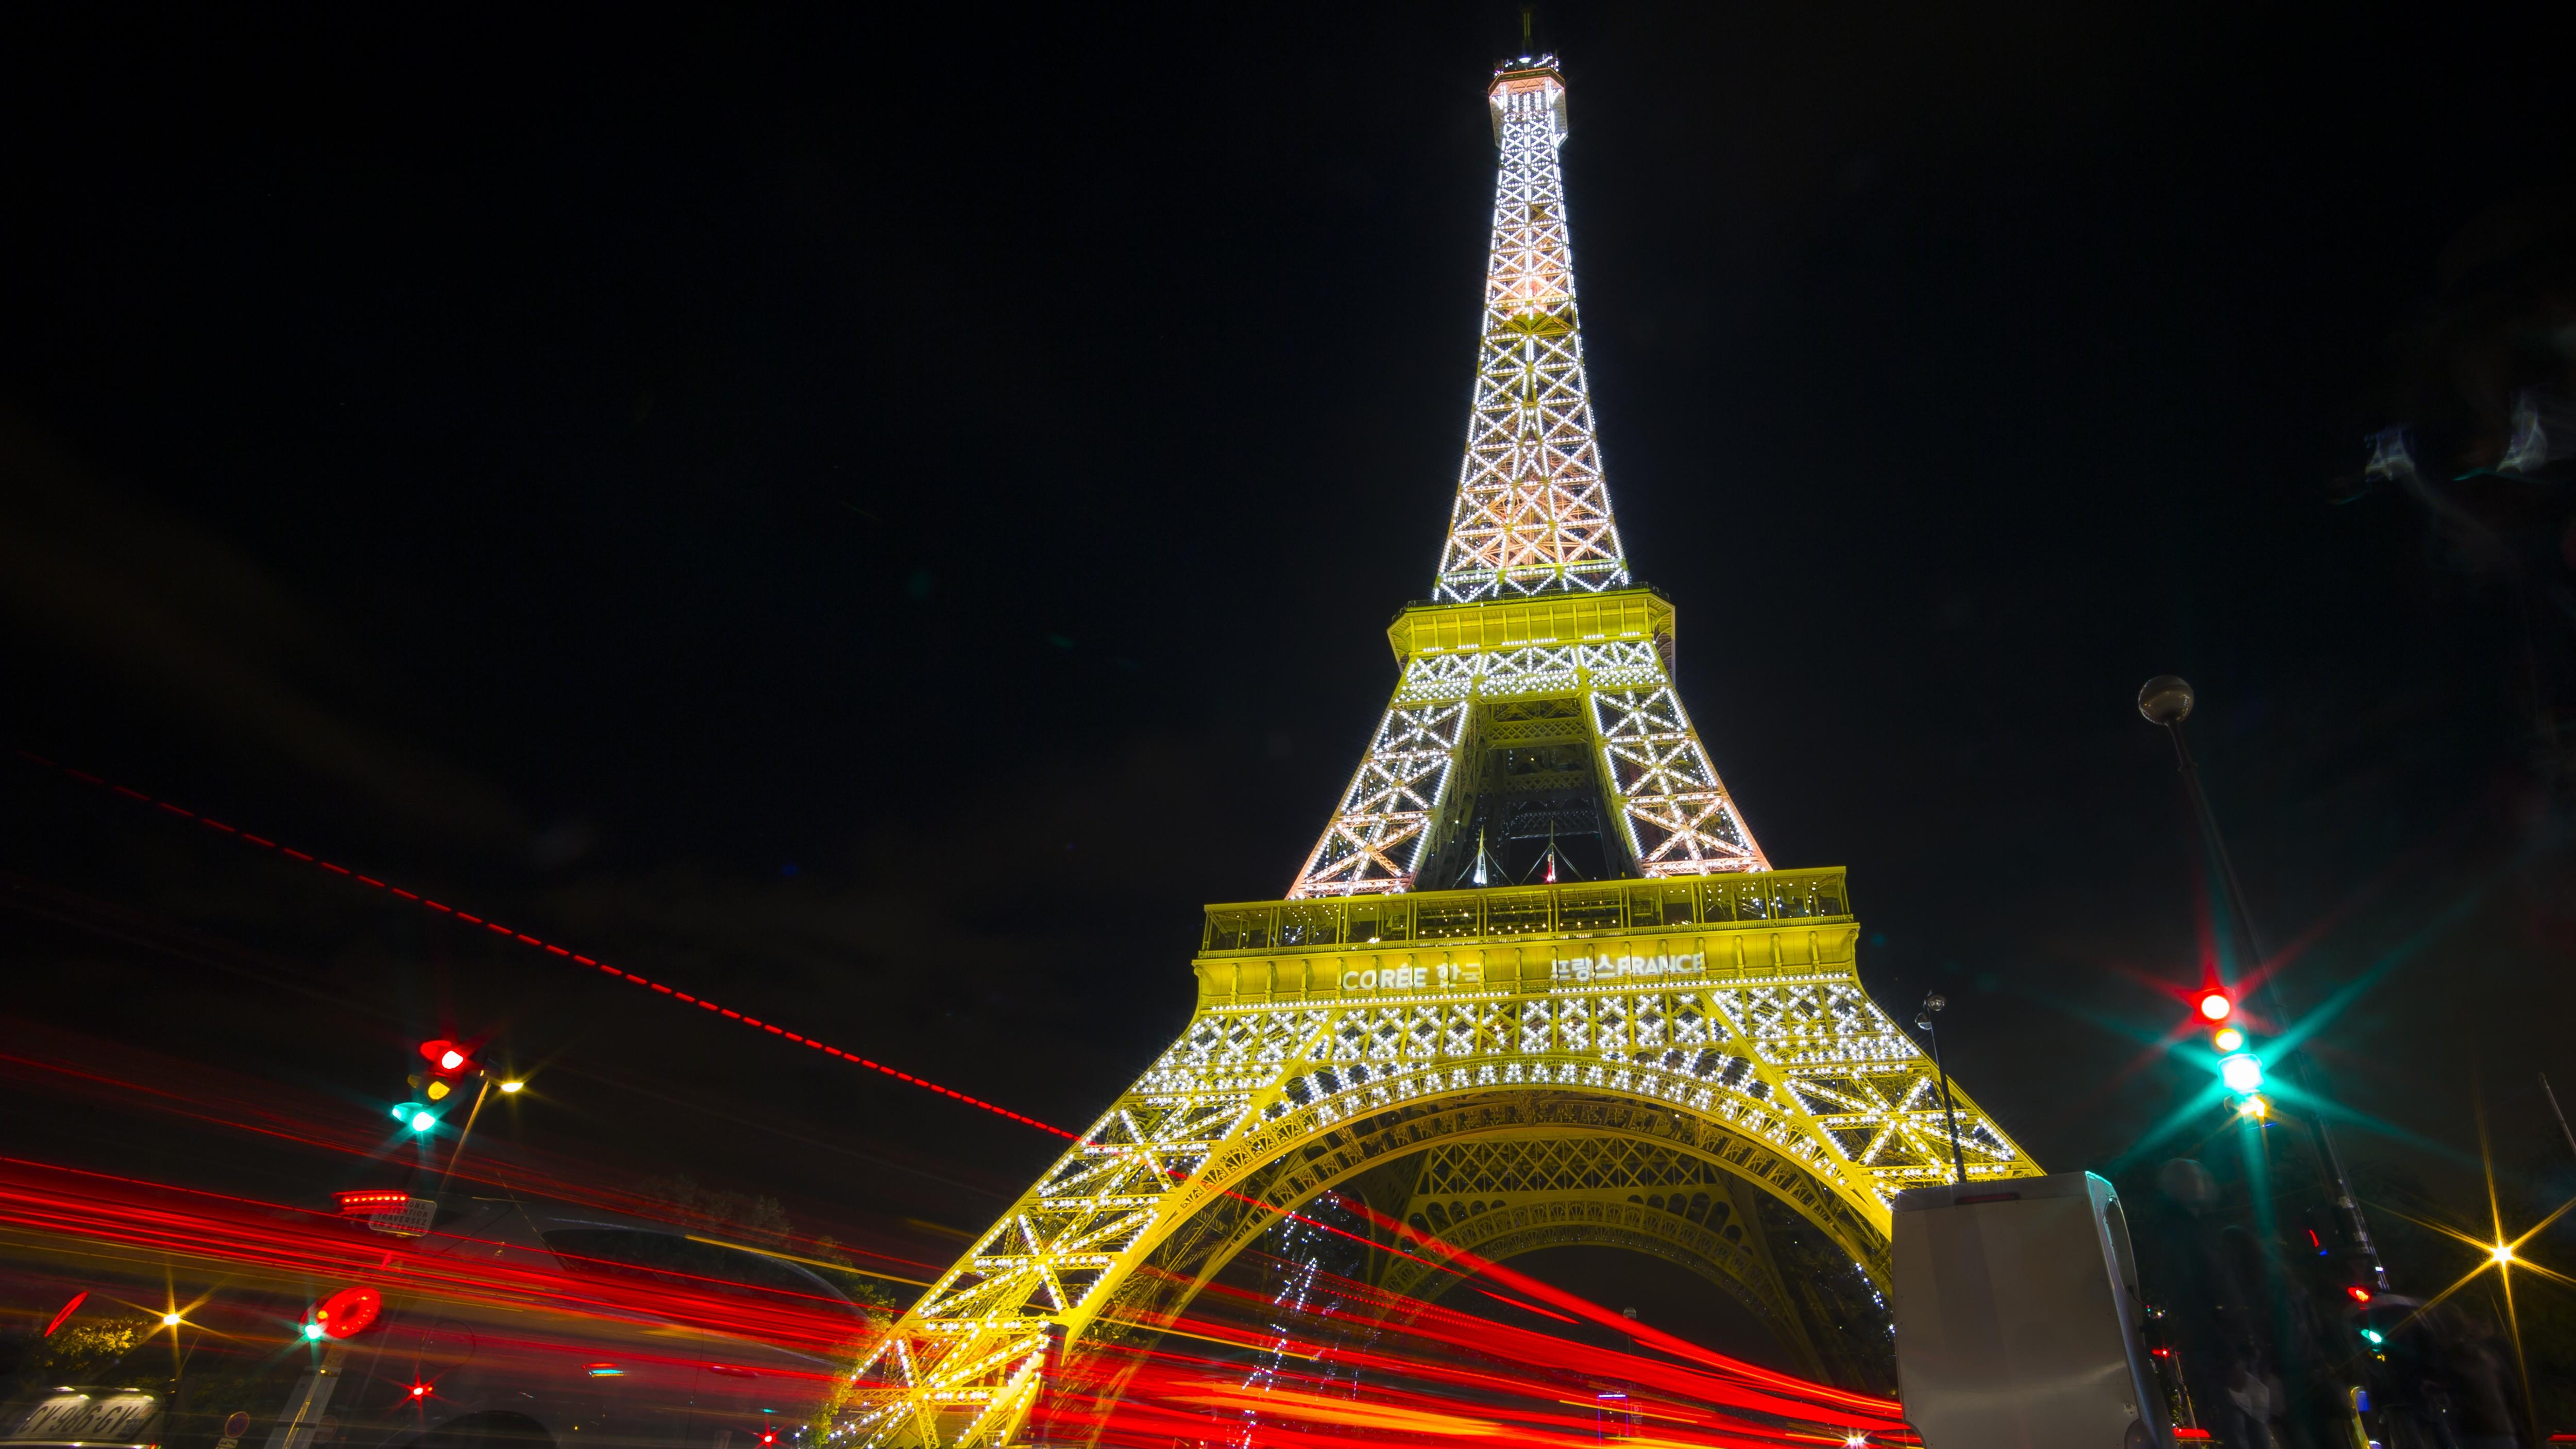 Eiffel Tower in Korean colors